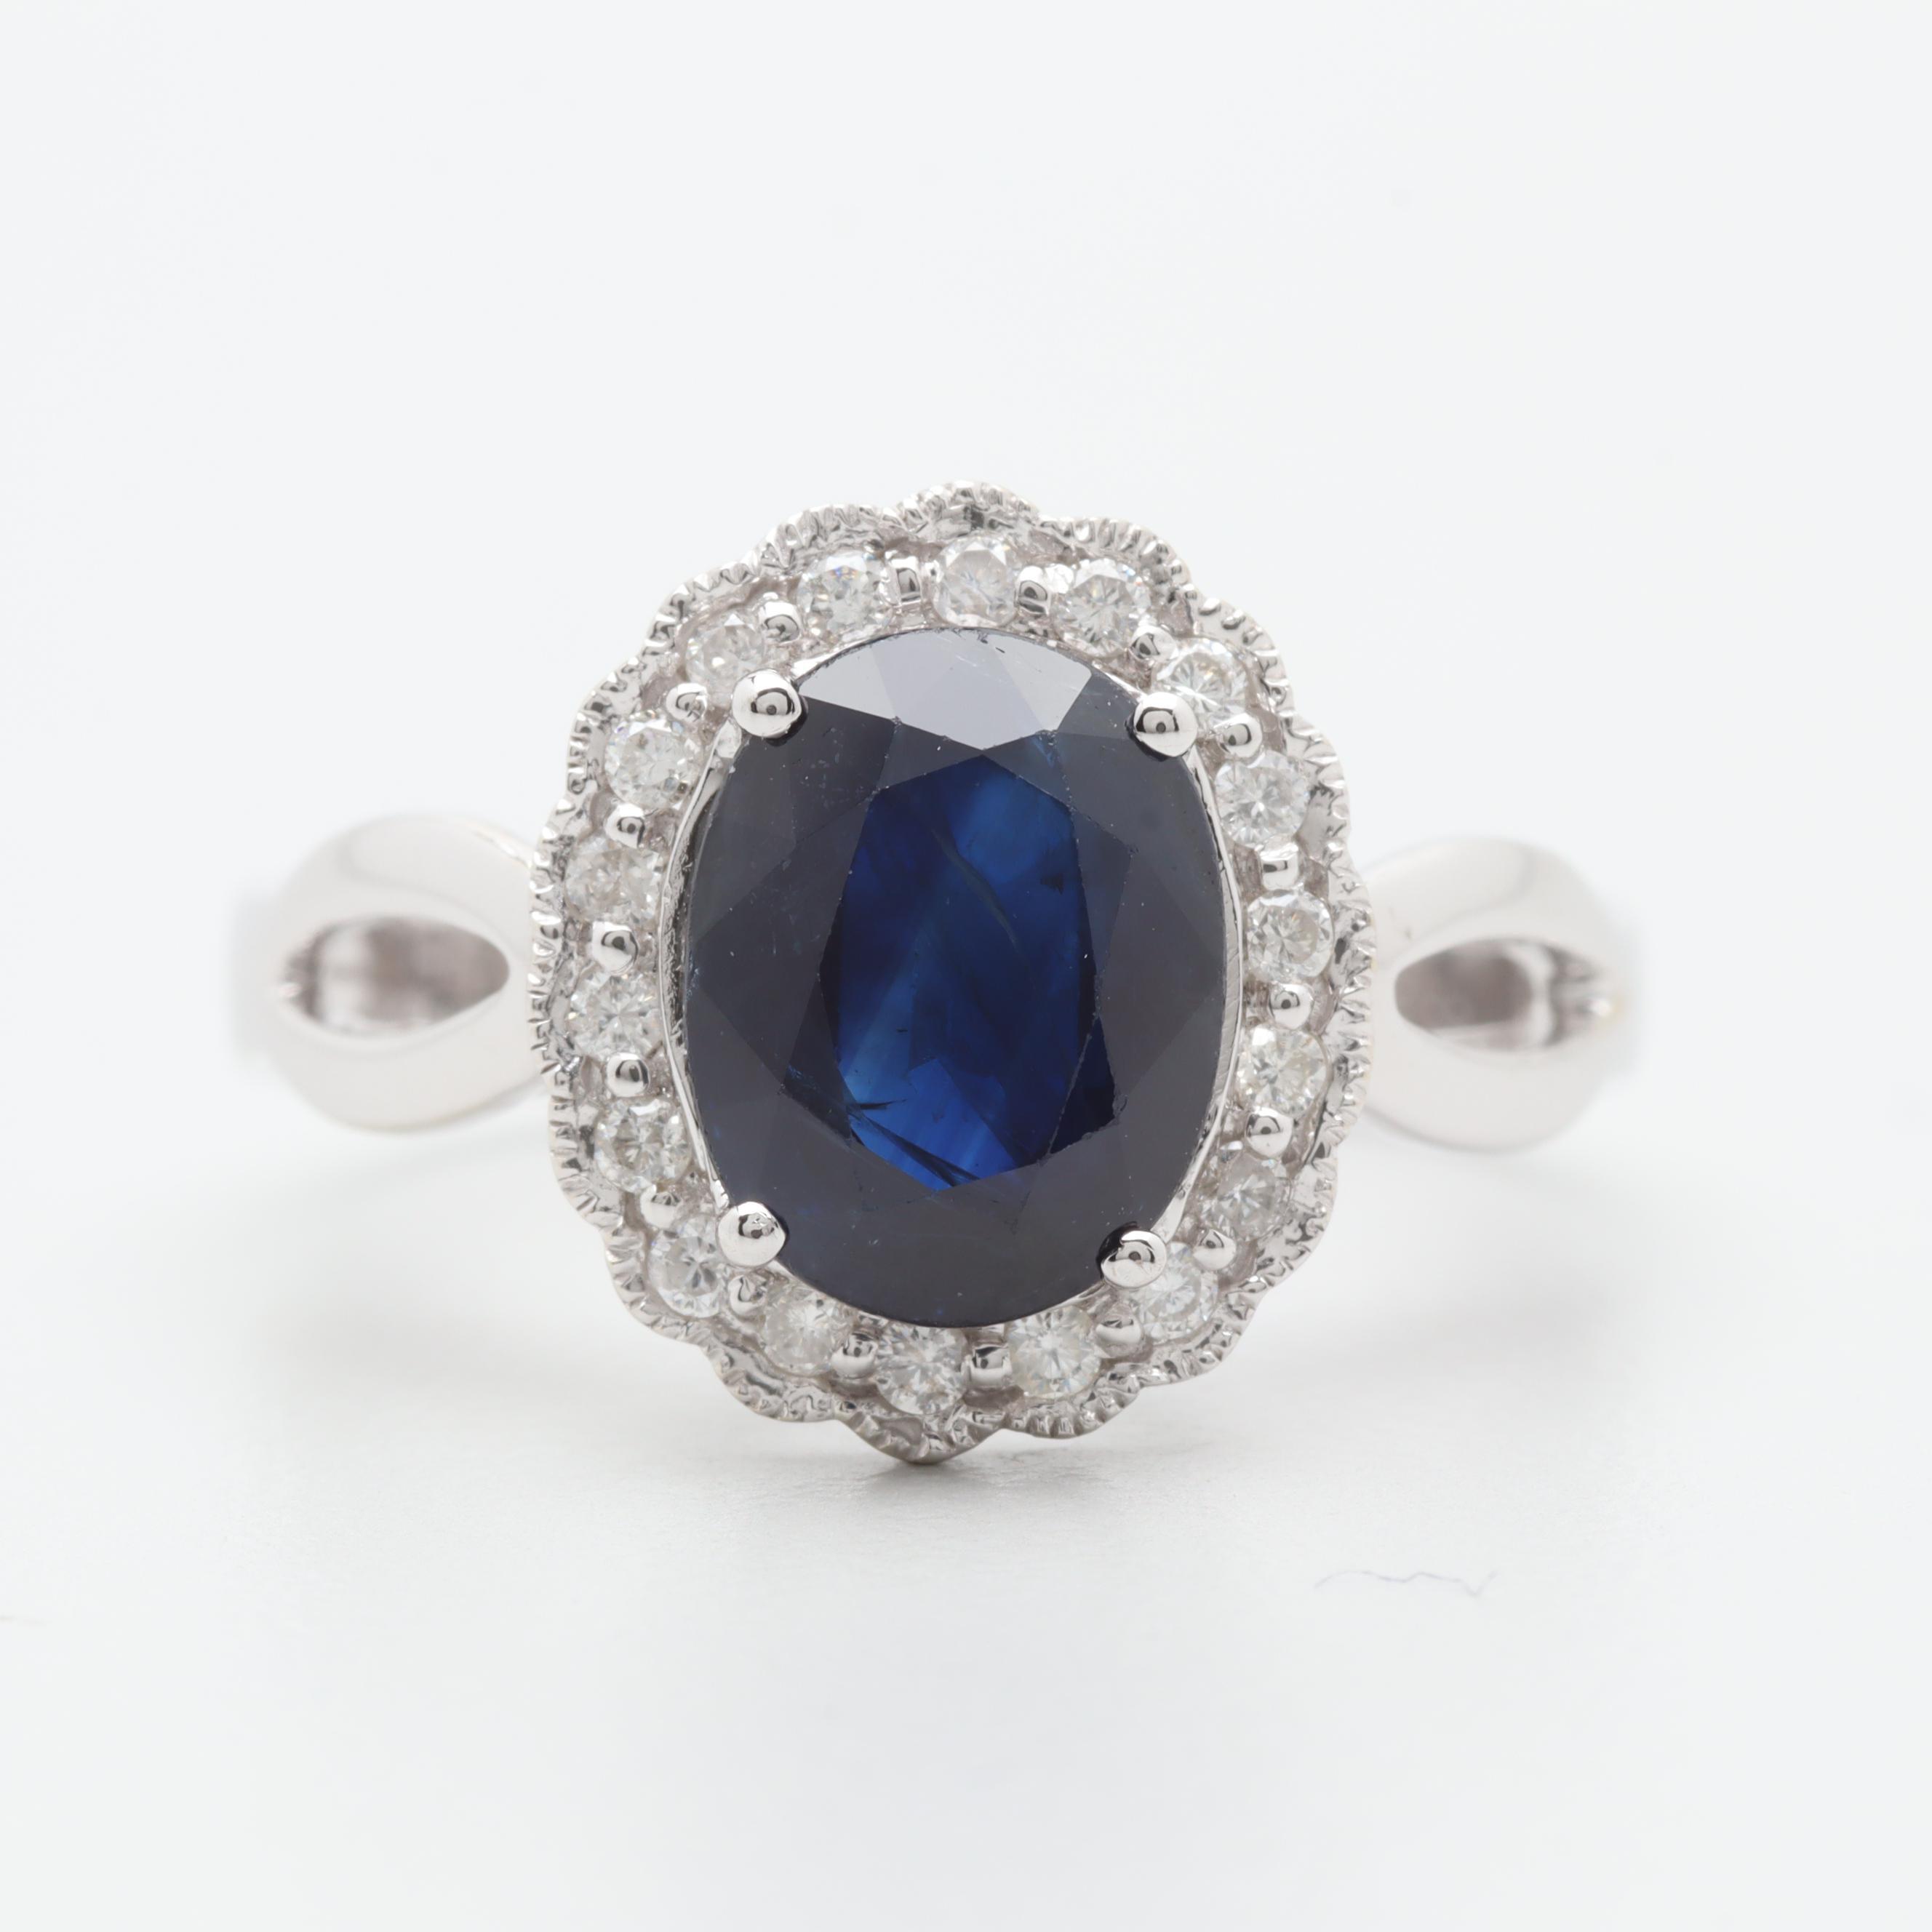 Michael Christoff 14K White Gold 1.97 CT Sapphire and Diamond Ring